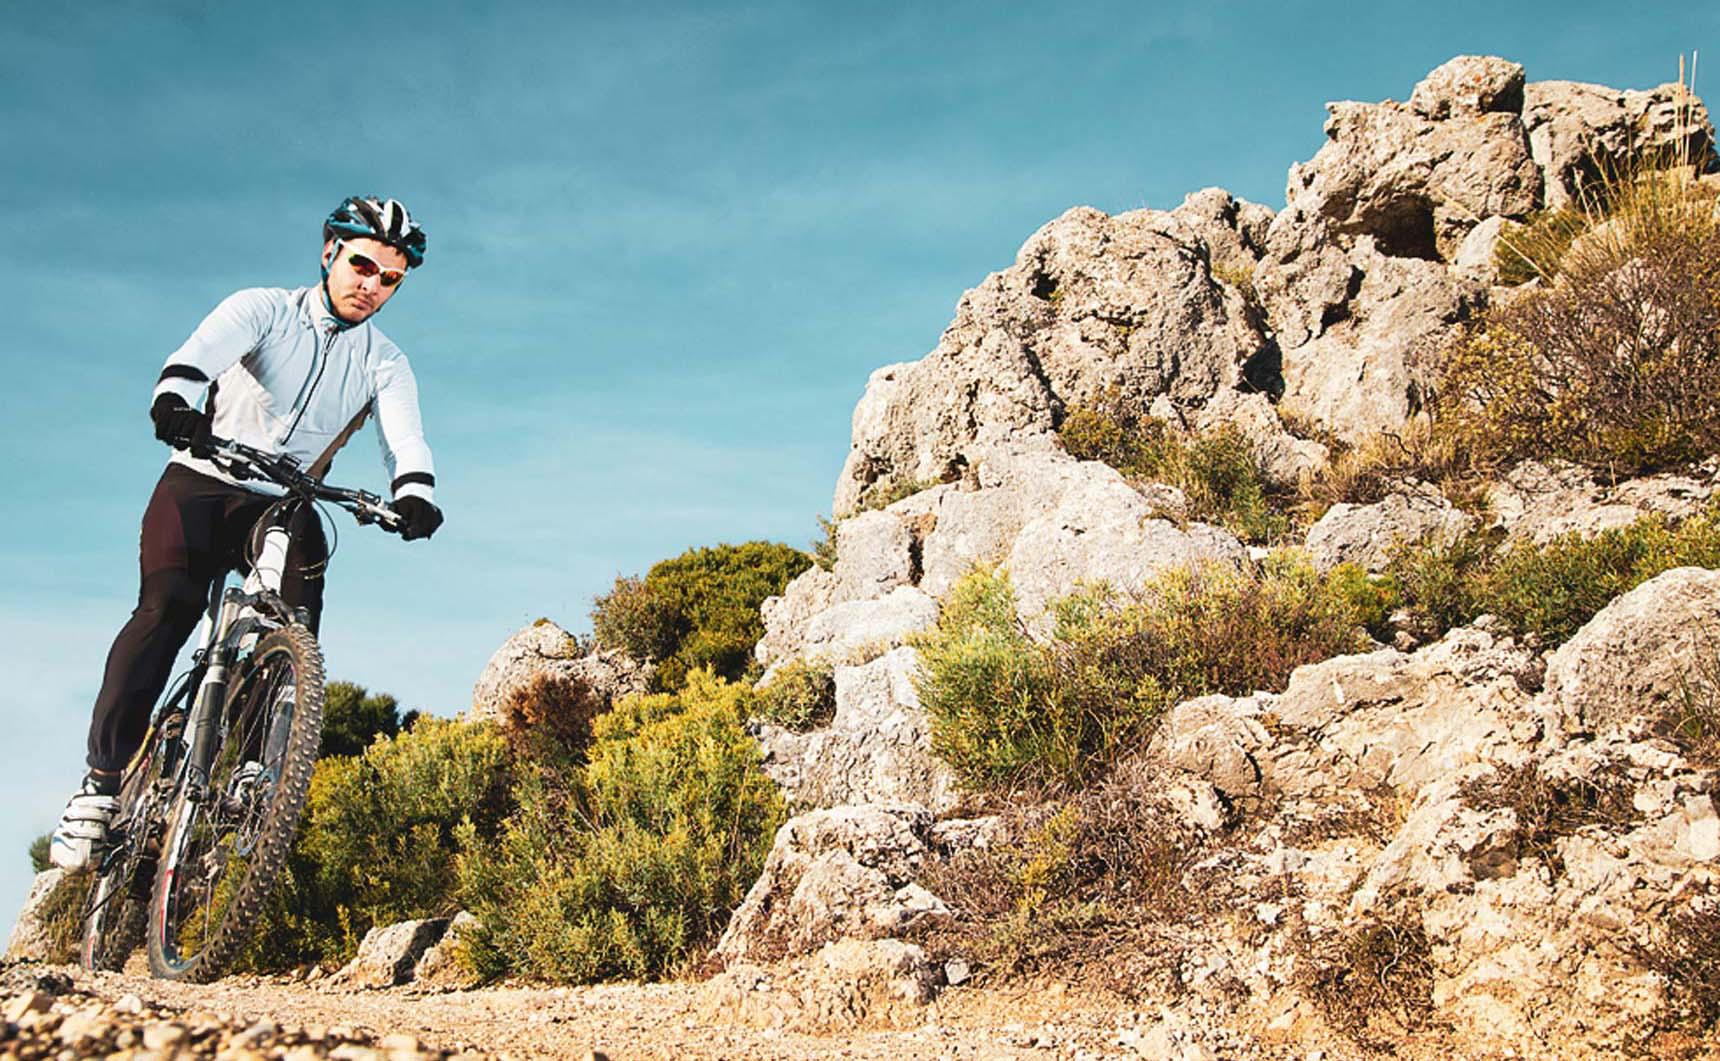 Laveno: Biking